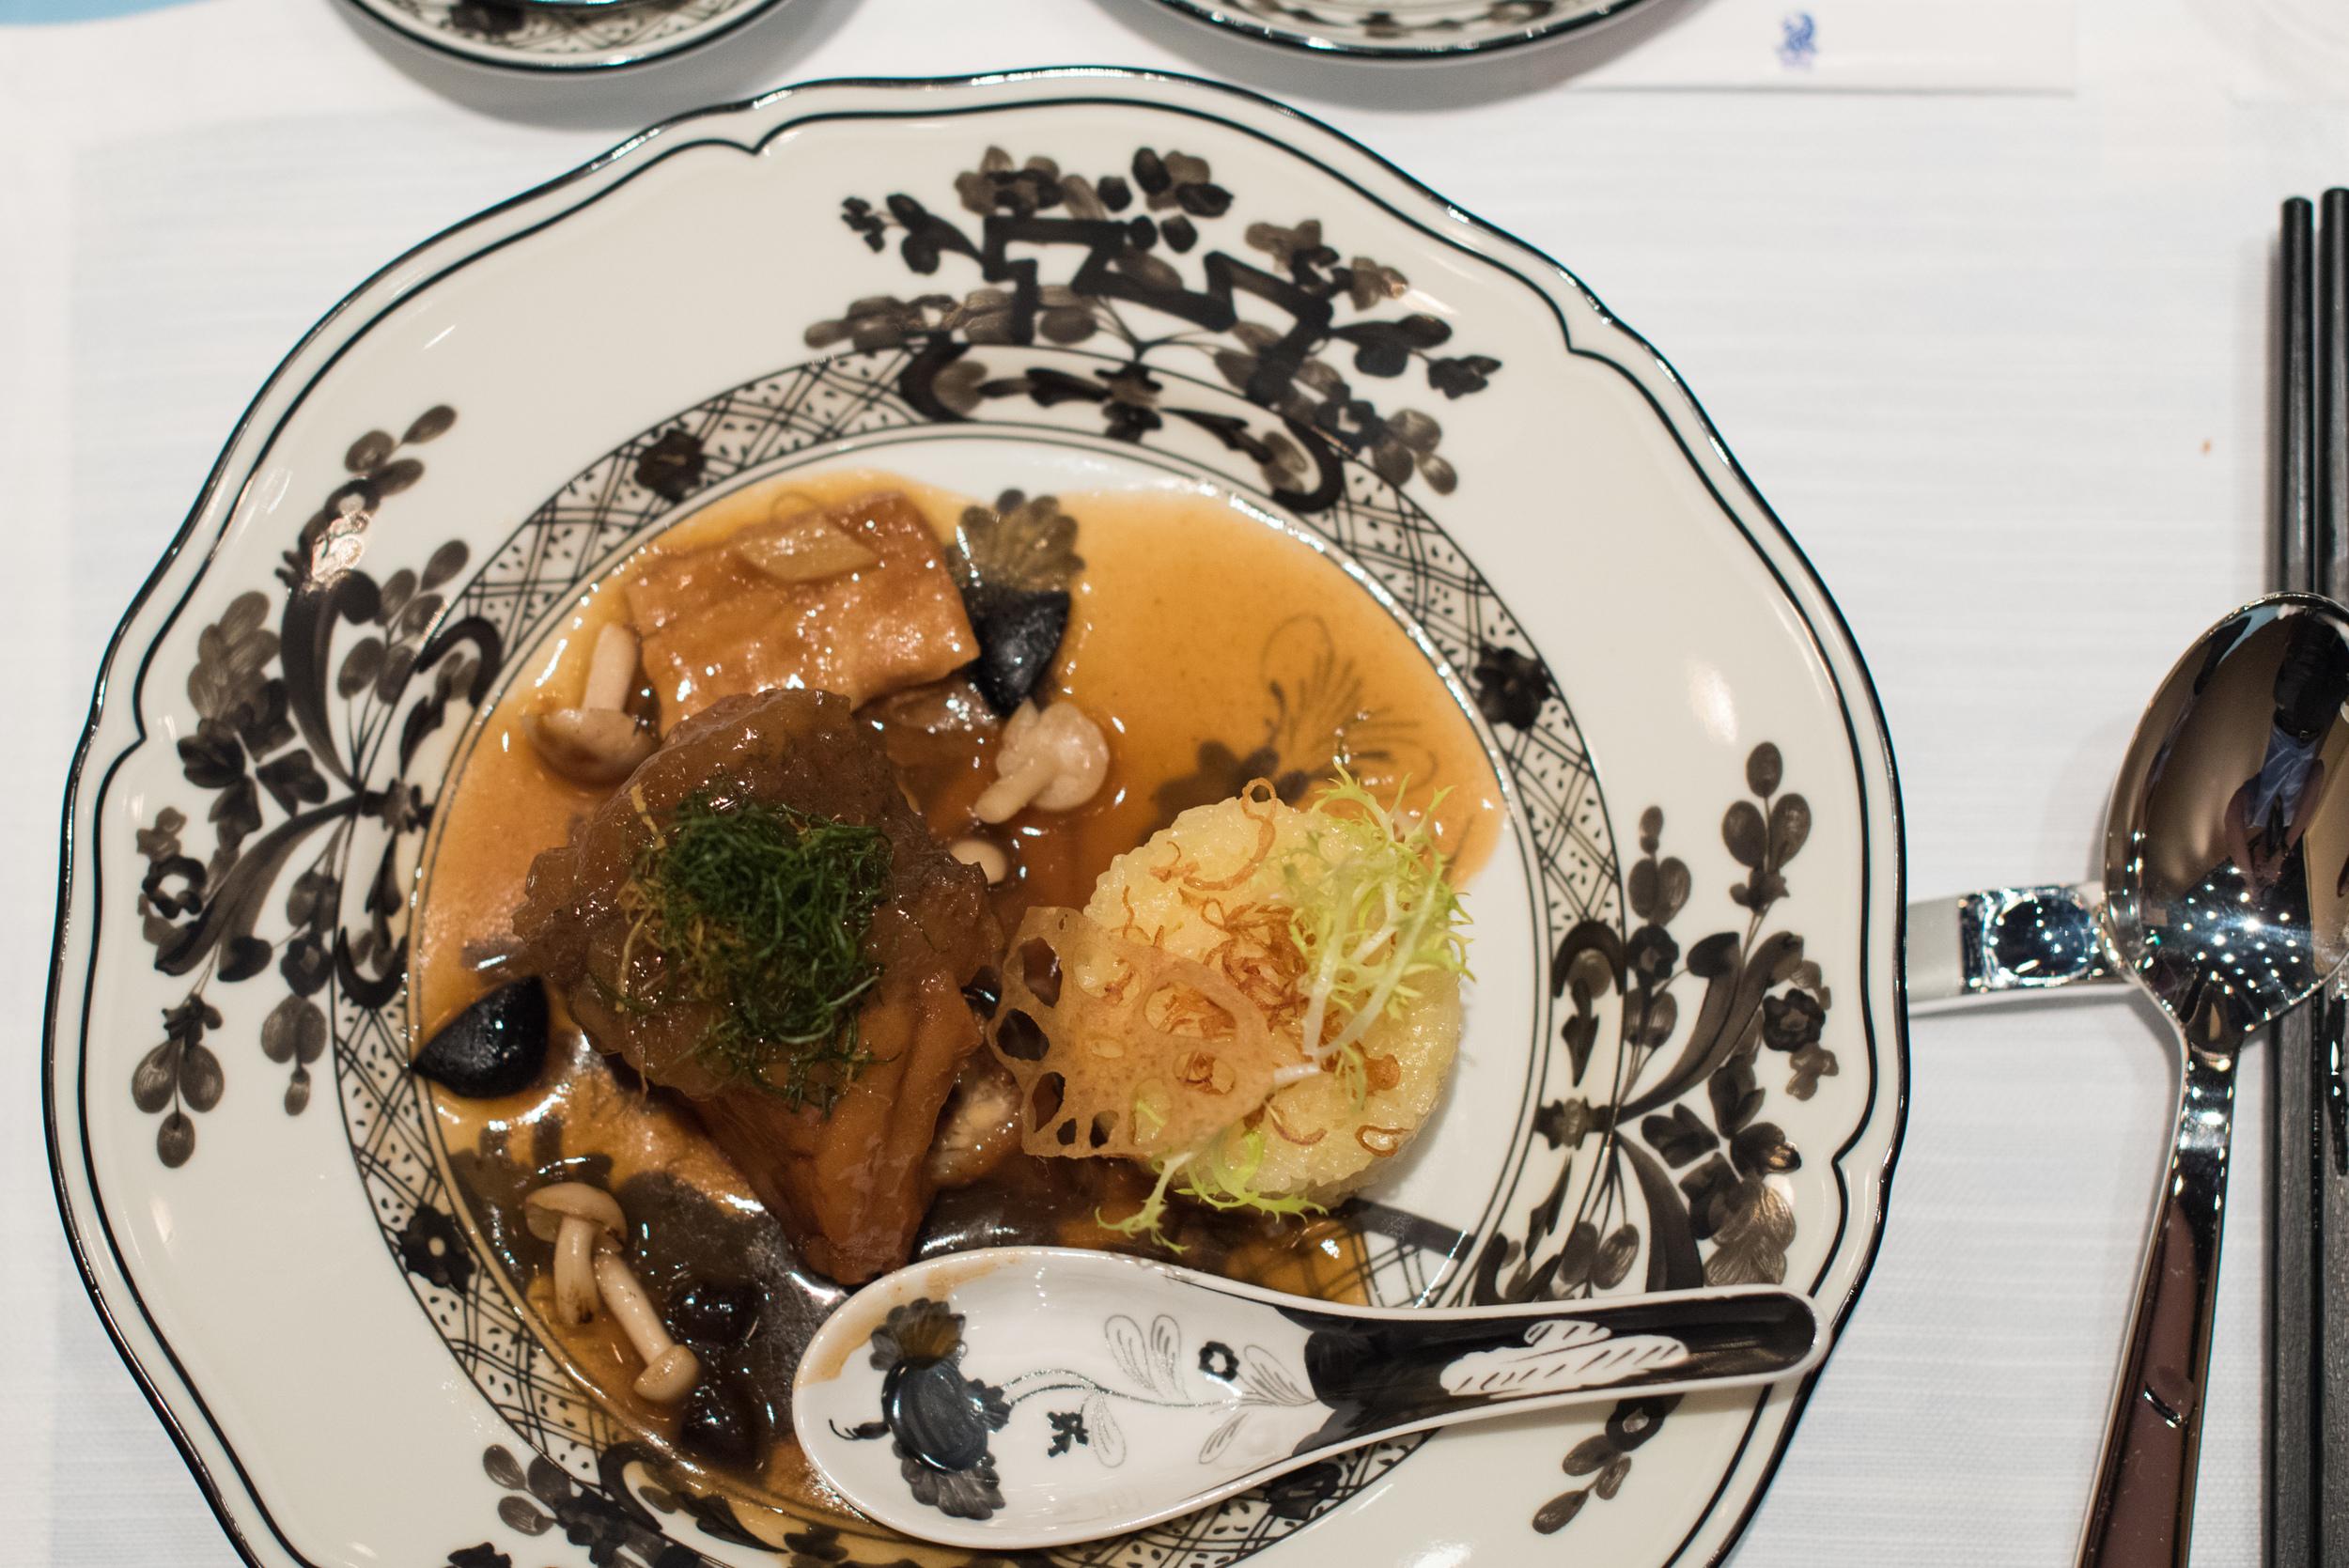 Braised Estuary Grouper, Dried Beancurd Skin, Mushroom, Organic Black Garlic, Steamed Glutinous Rice, Spring Onion    Summer Pavilion - The Ritz-Carlton, Millenia Singapore